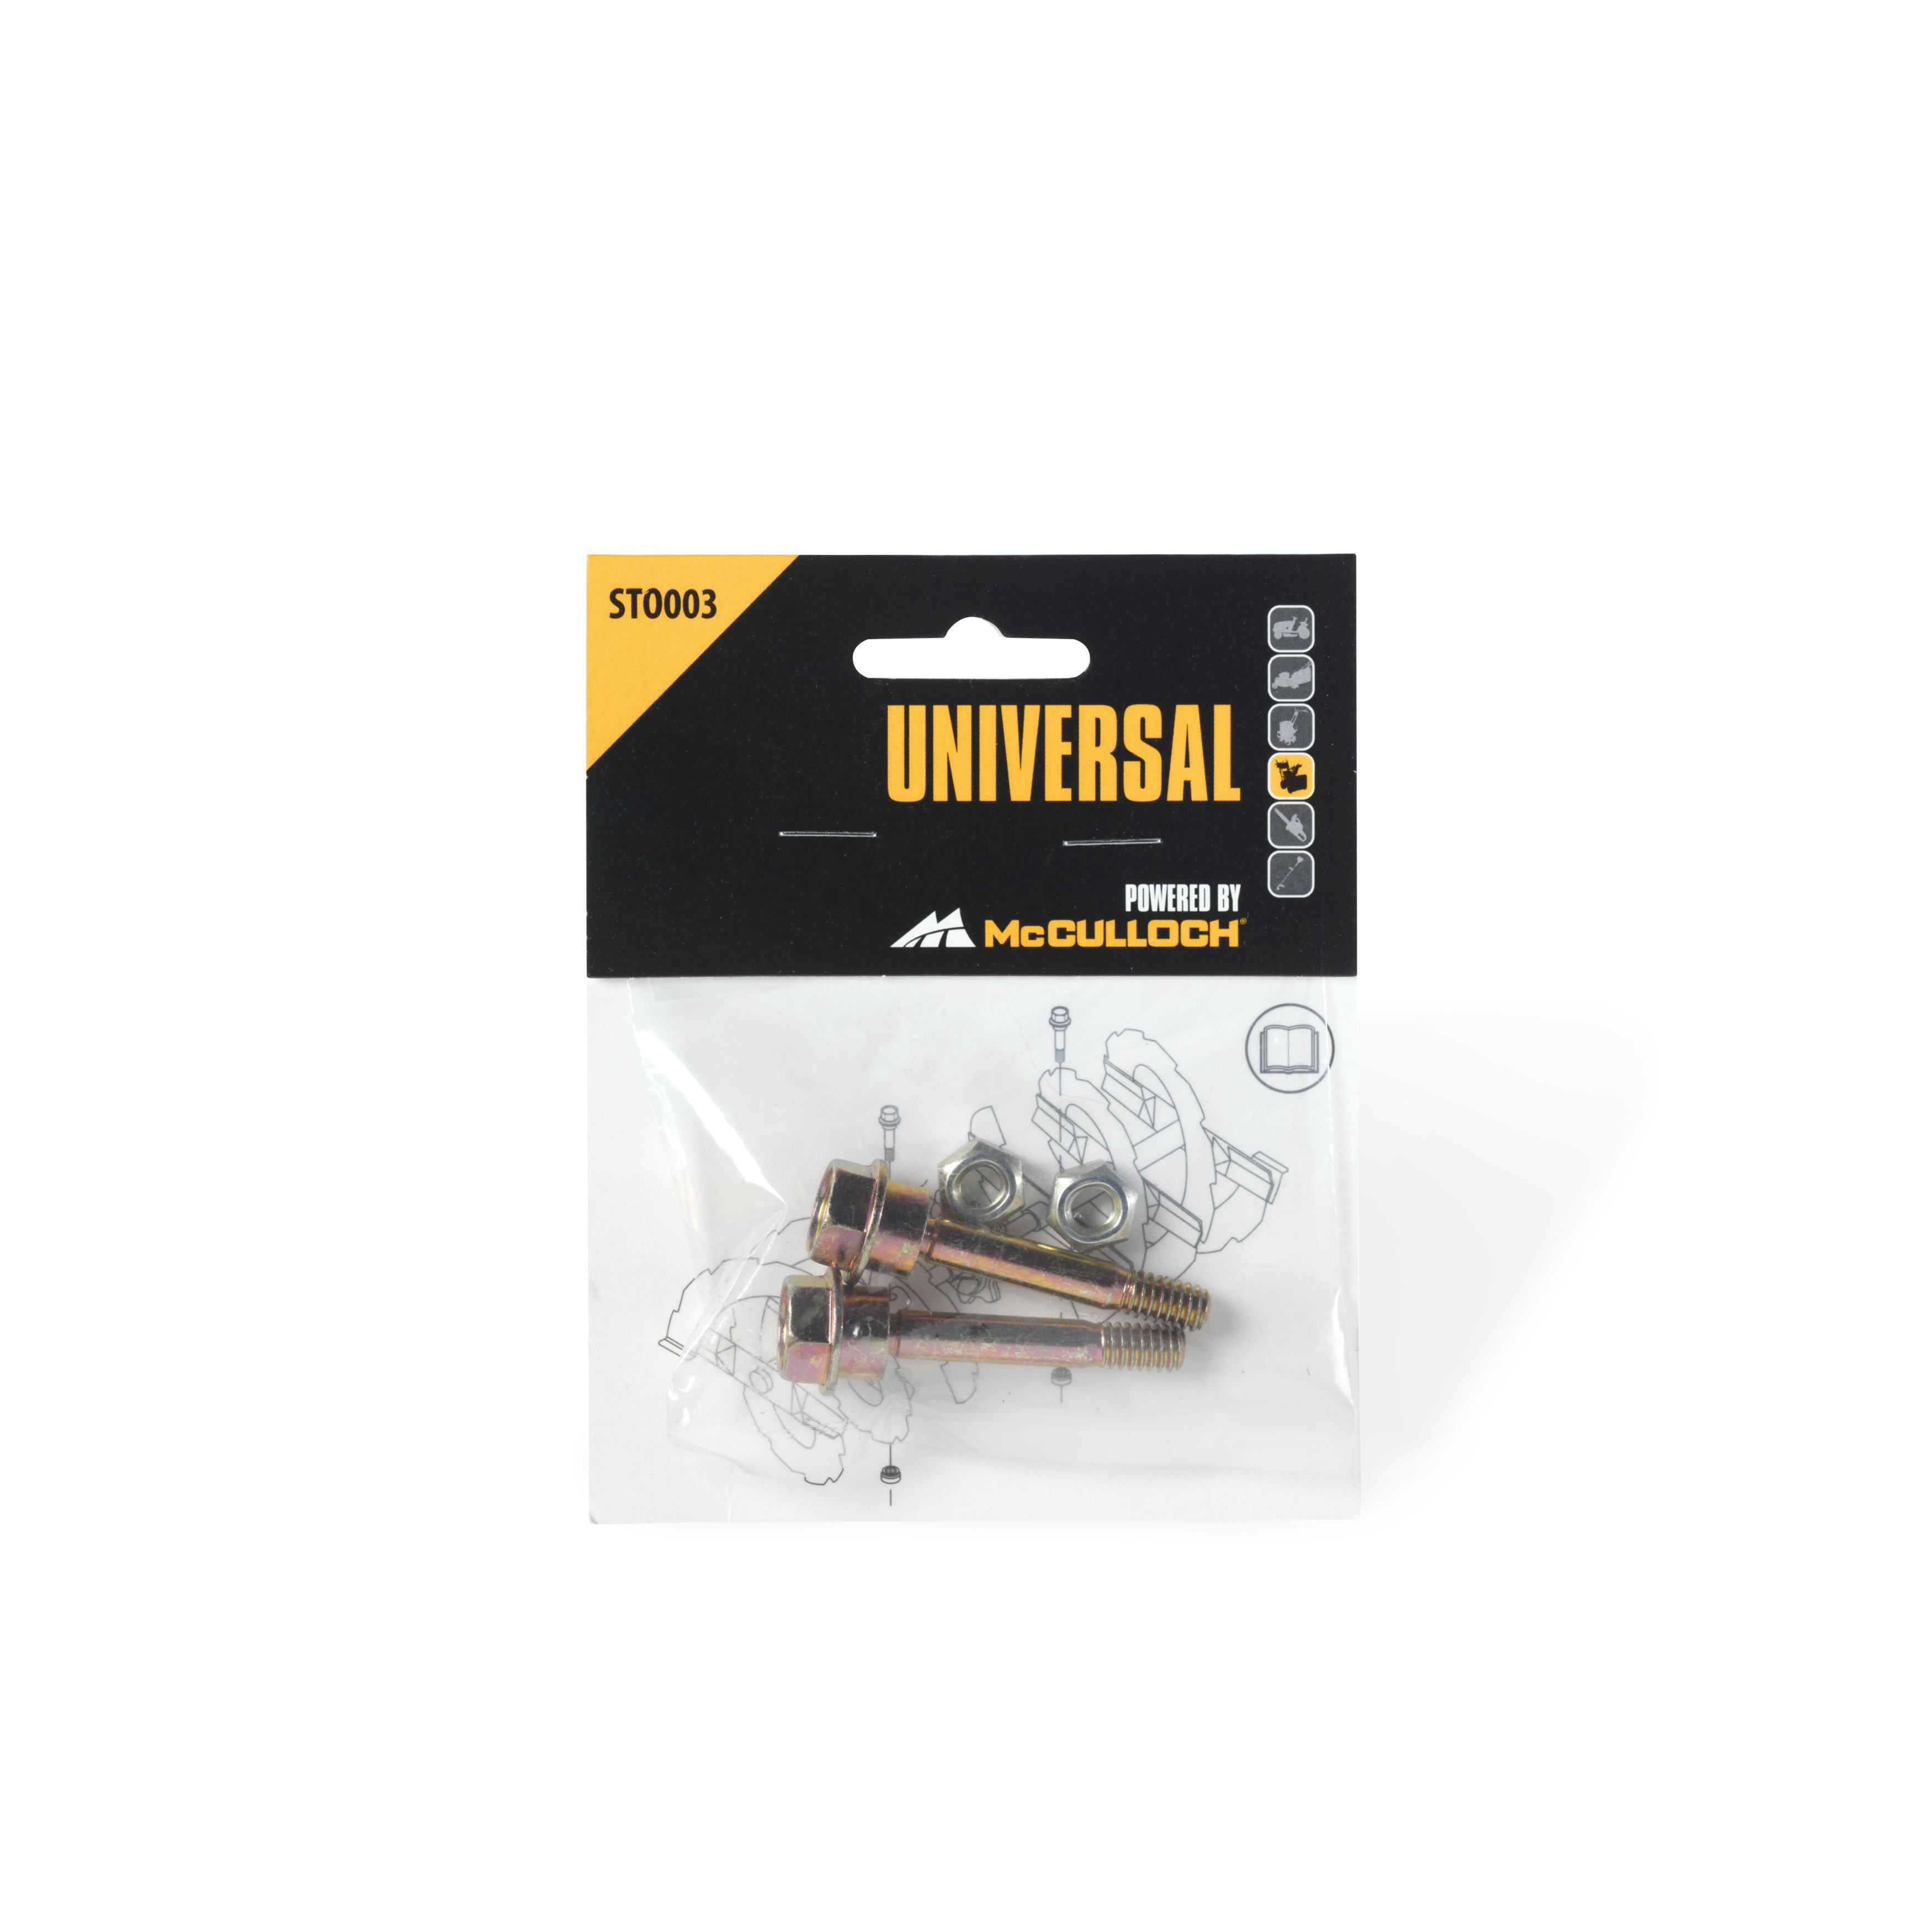 Brytpinnar McCulloch Universal STO003 2-pack